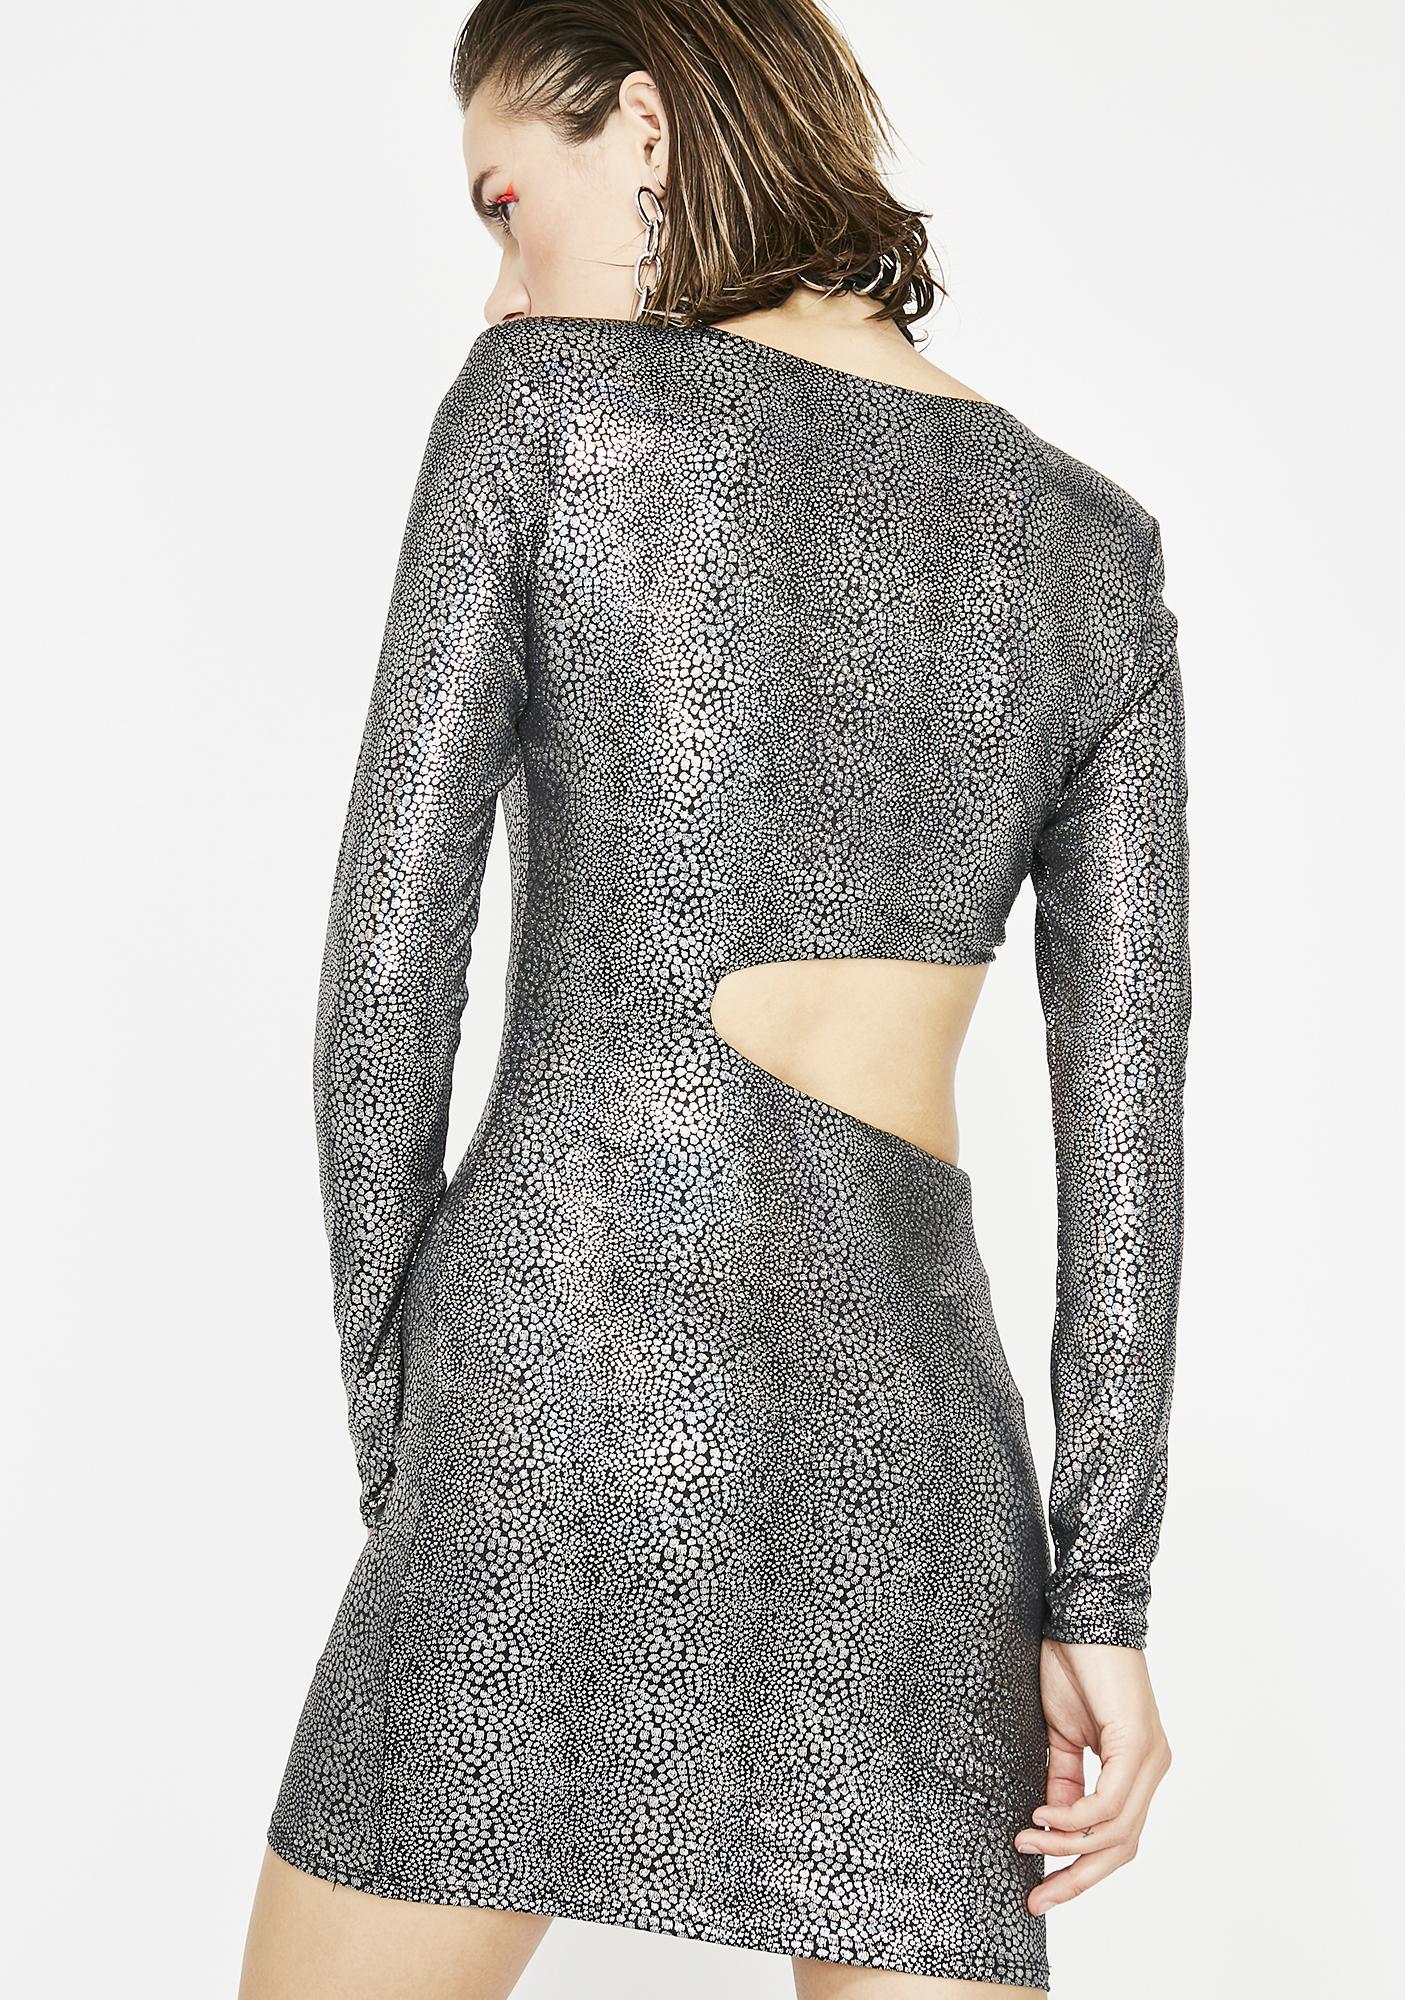 Cosmic Spirit Mini Dress